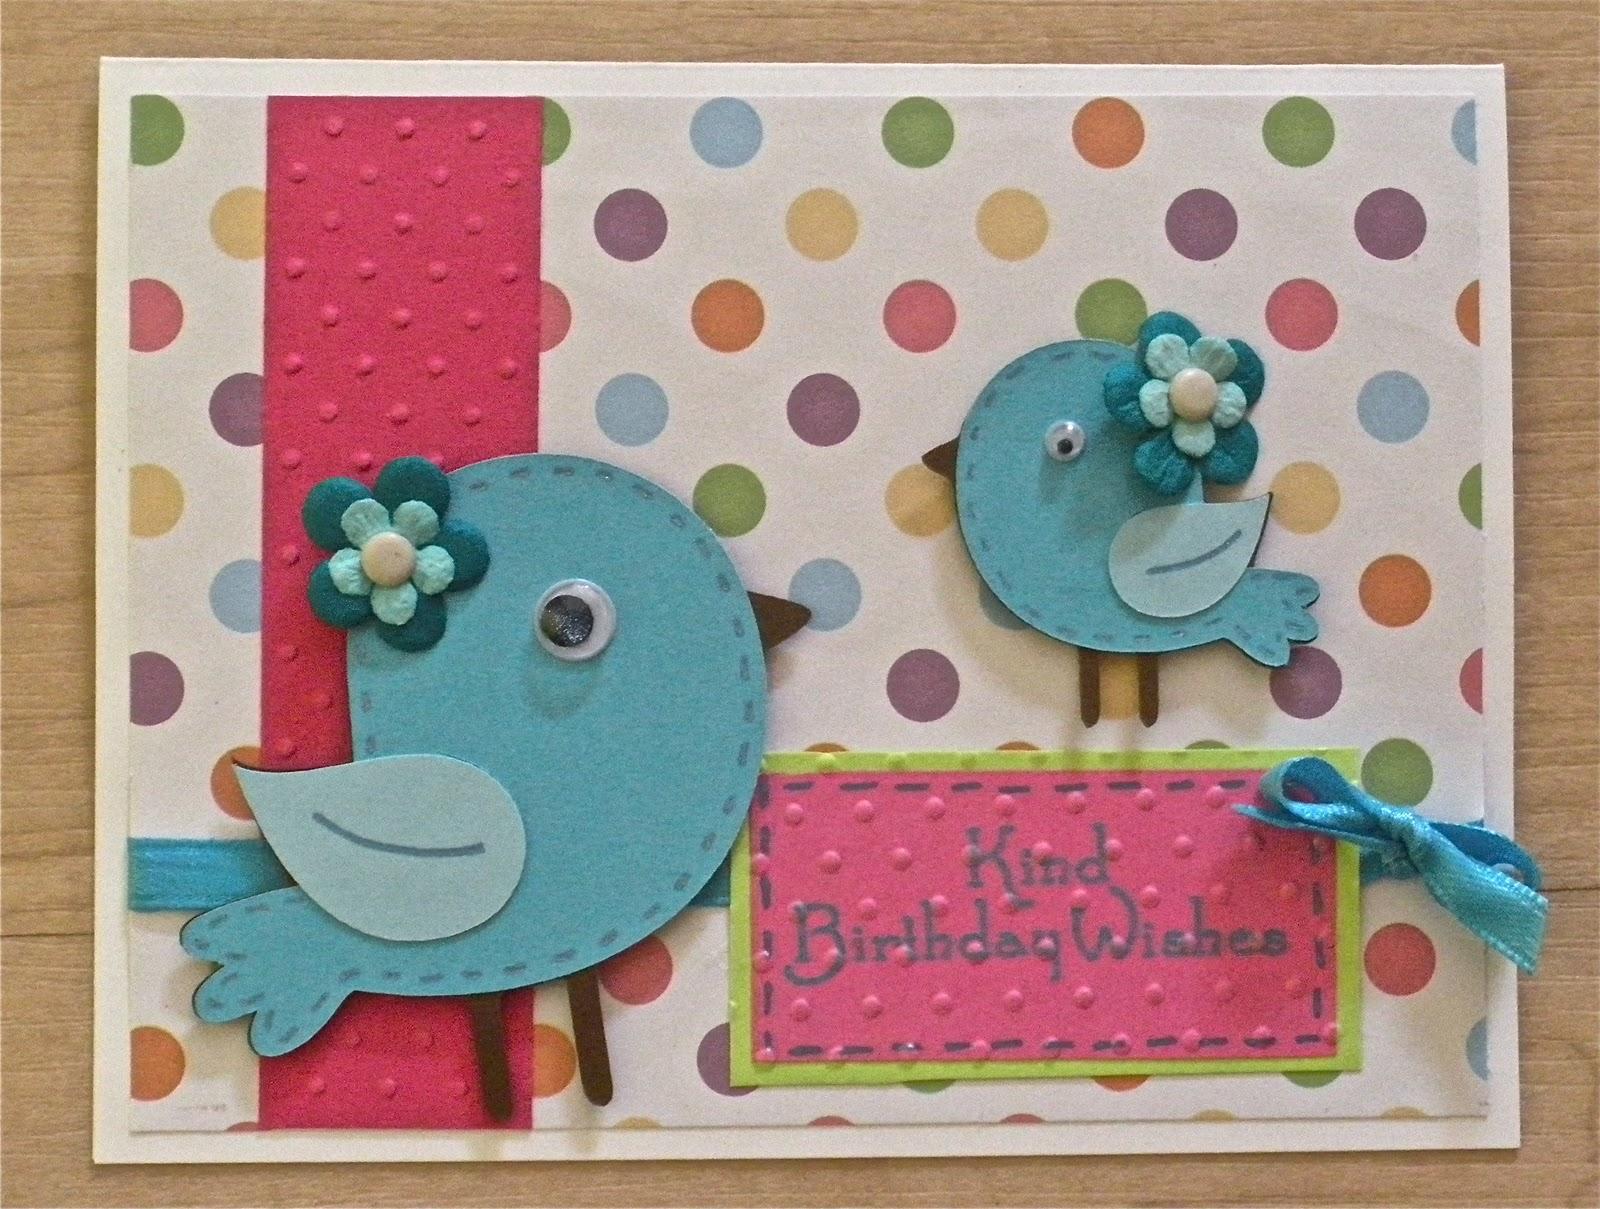 Funky Cards My Cricut Craft Room Card Creating Sunday